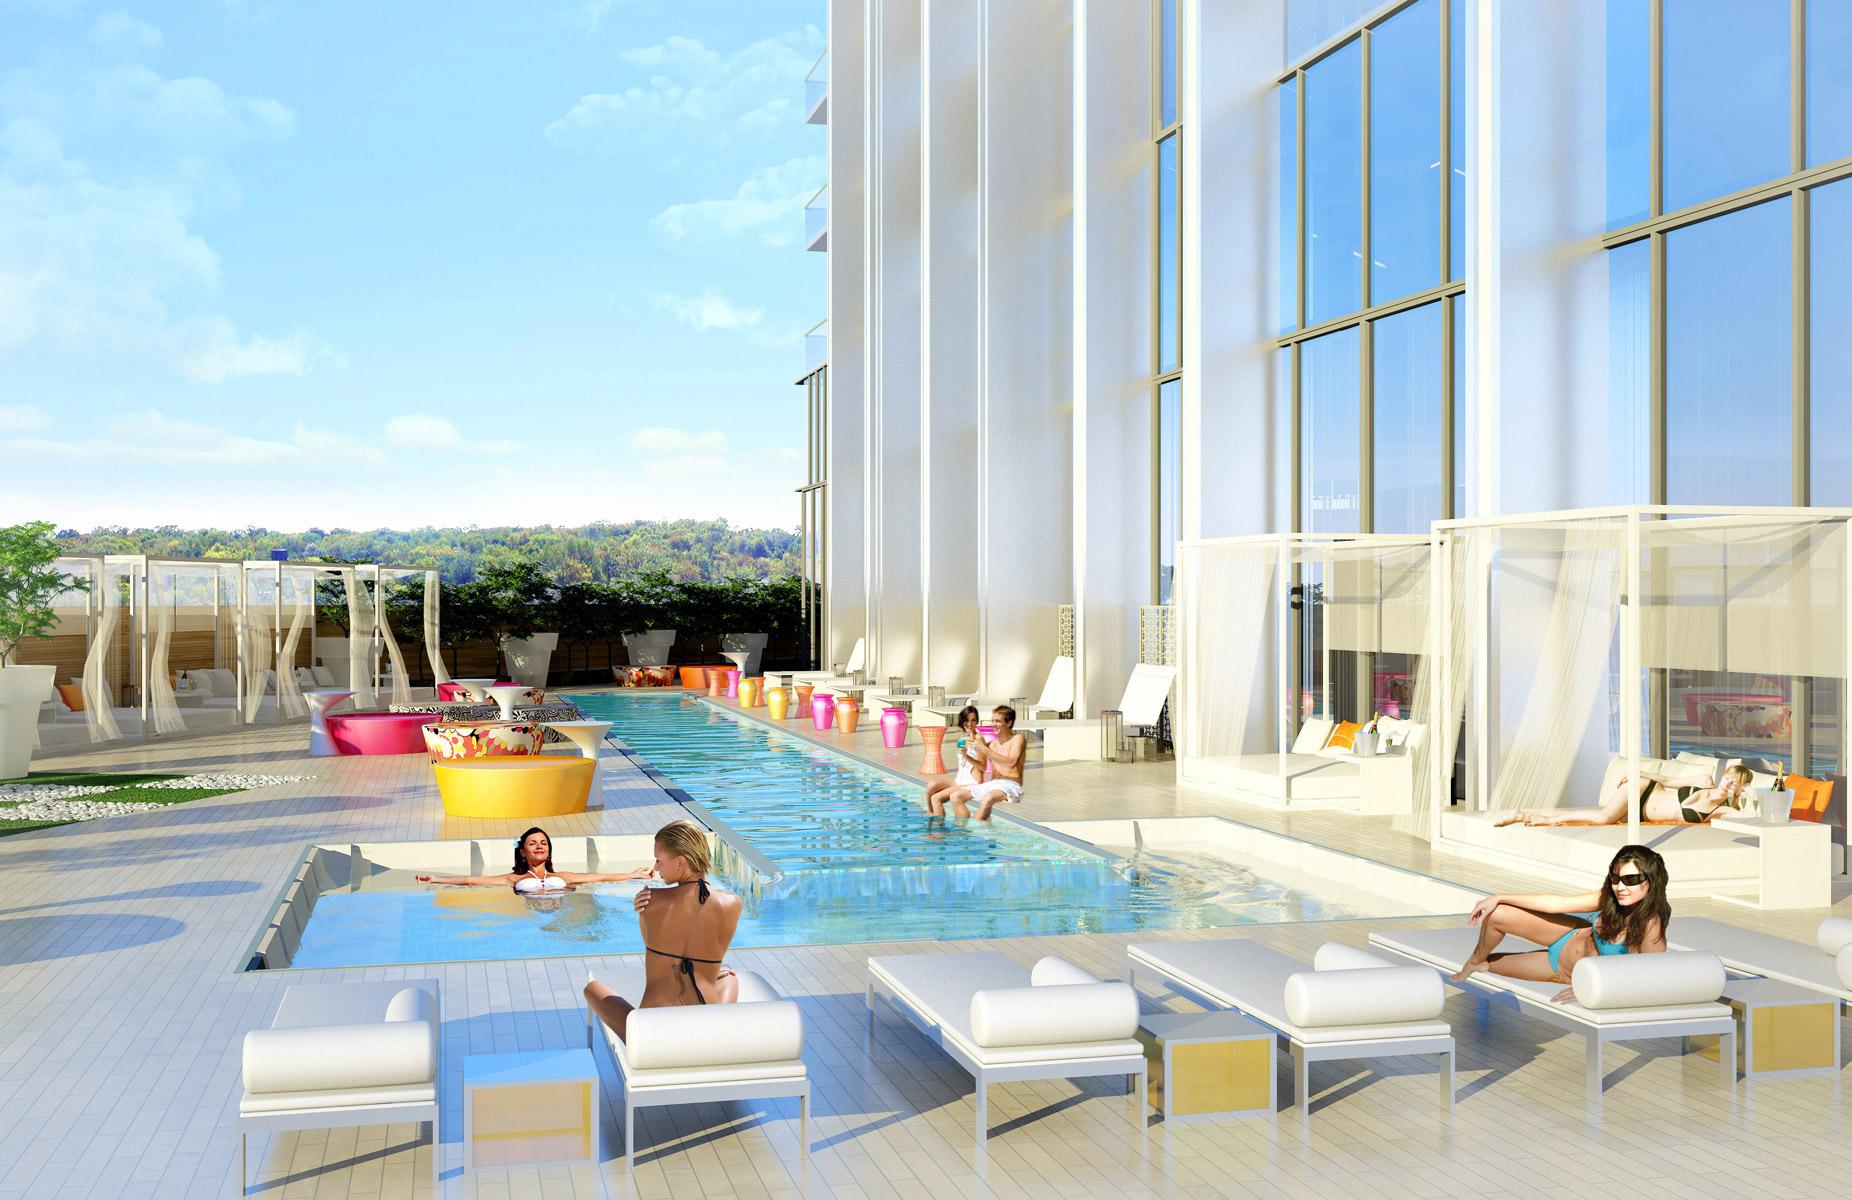 ... Kong Luxury Apartment Design. on home interior architecture design